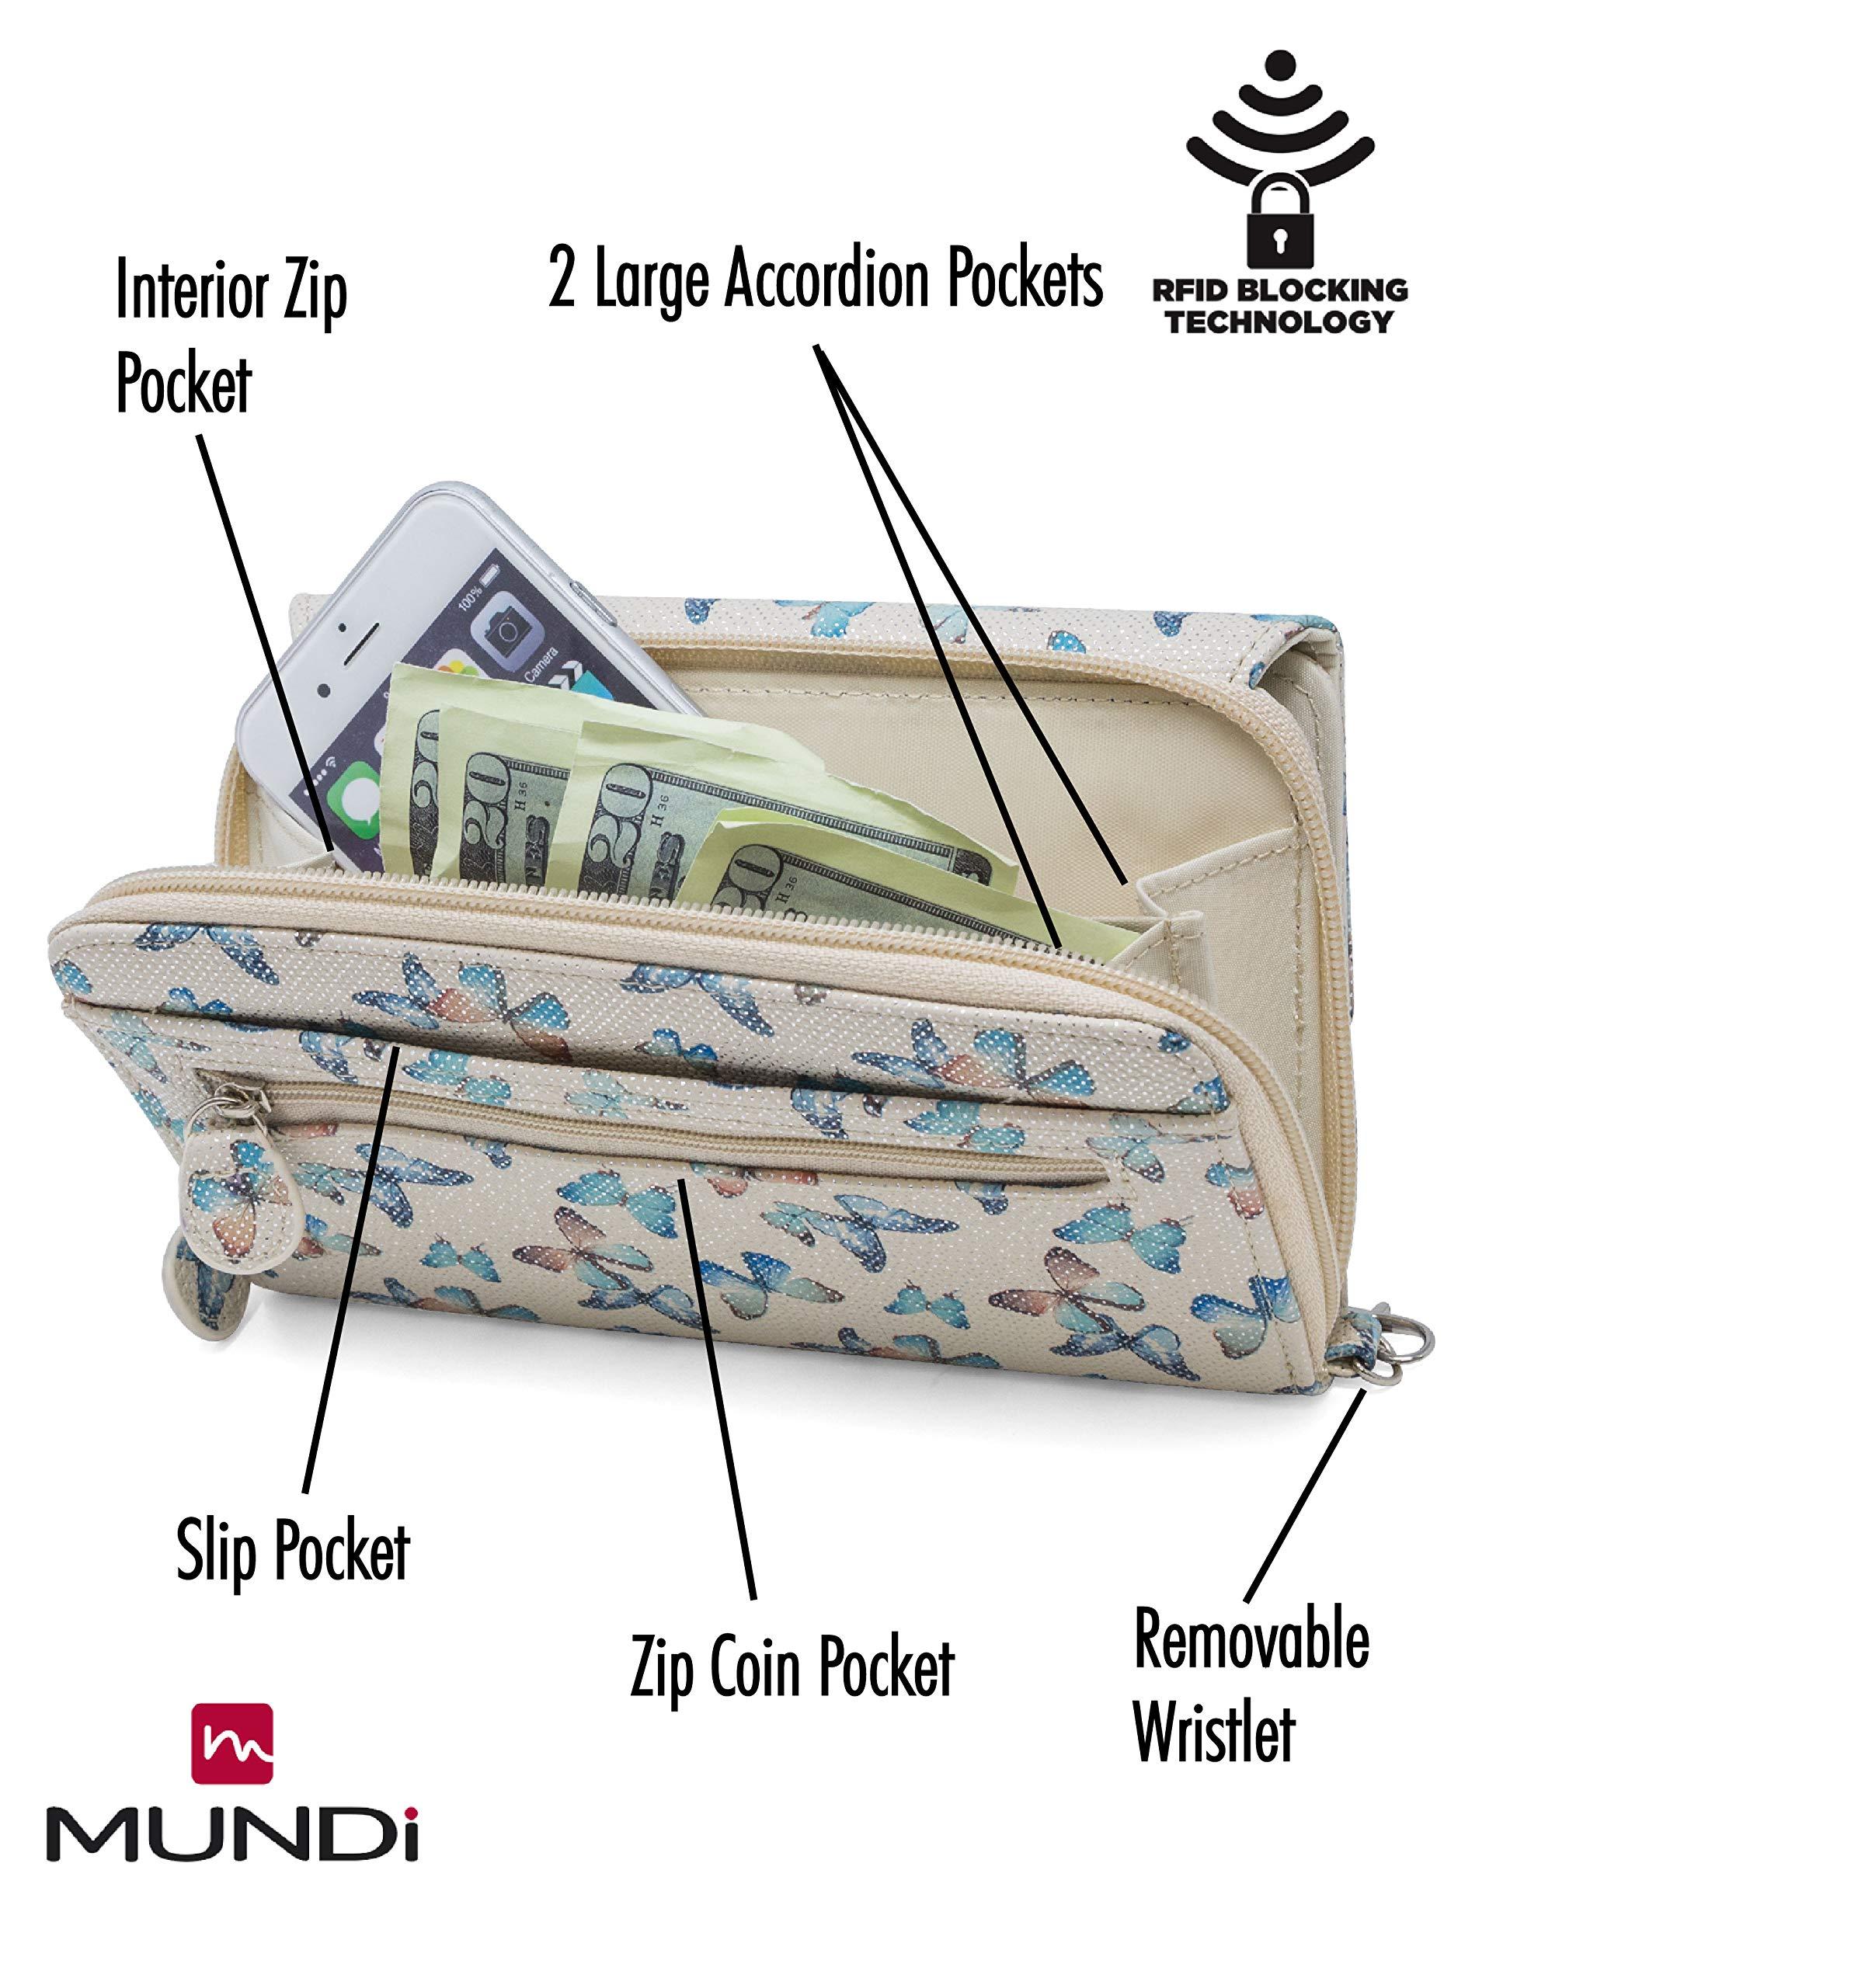 MUNDI Big Fat Womens RFID Blocking Wallet Clutch Organizer Removable Wristlet (Flutter) by Mundi (Image #3)